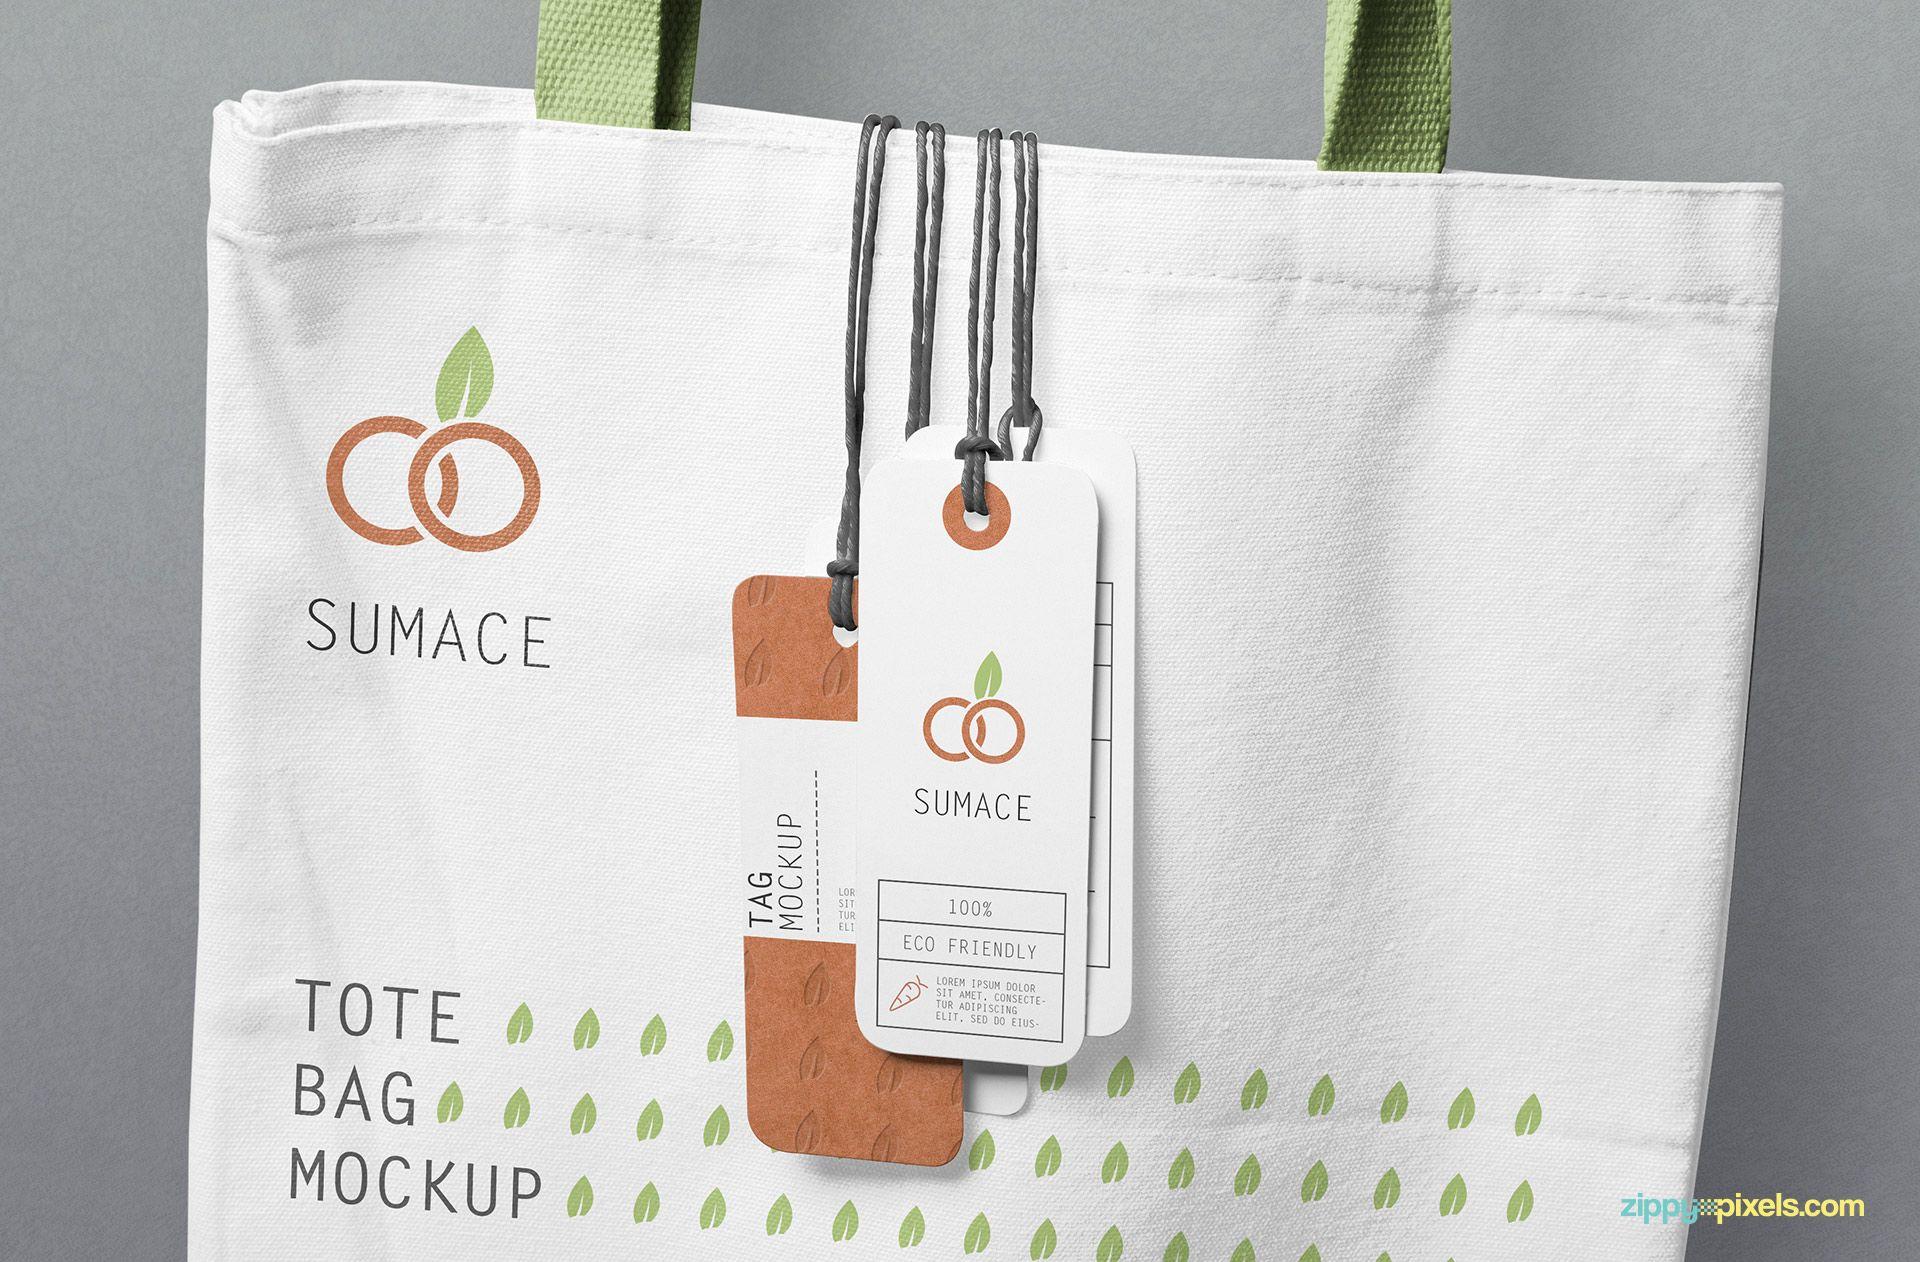 Download Free Hanging Tags Mockup Zippypixels Tote Bag Best Tote Bags Bag Mockup